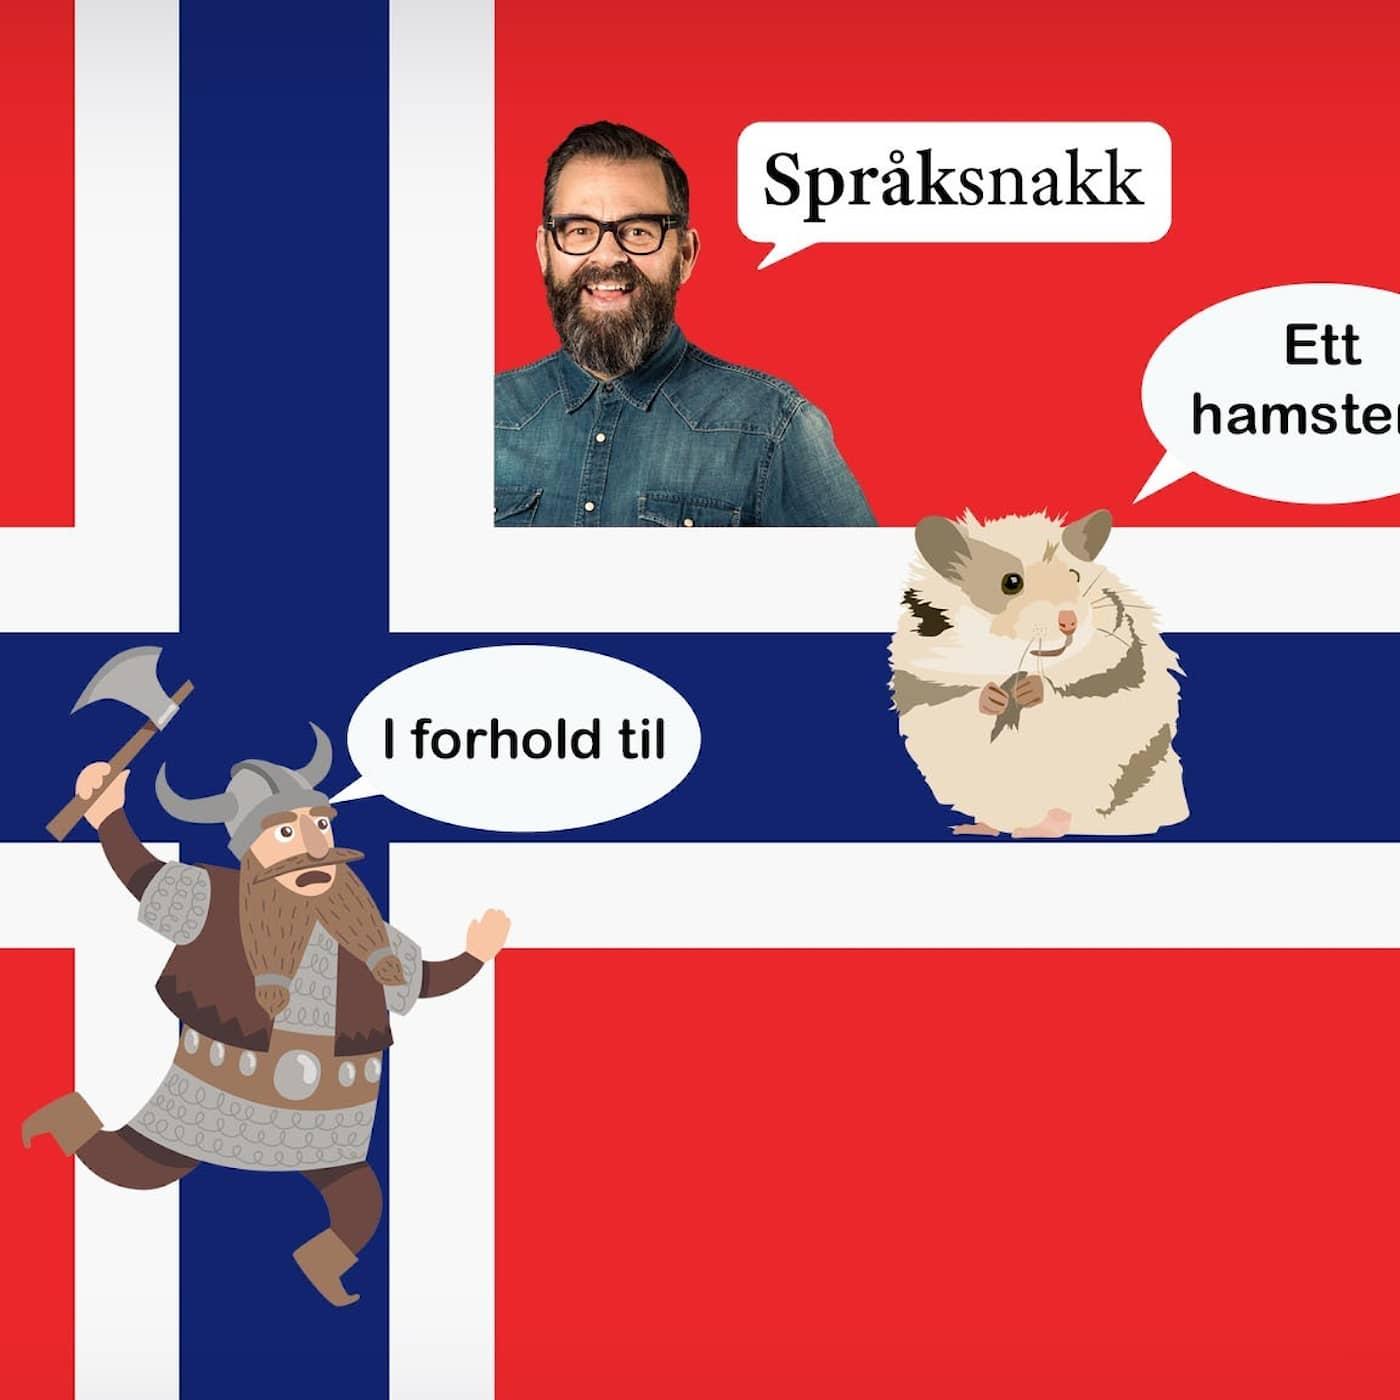 17 maj: Vi snakker norsk!